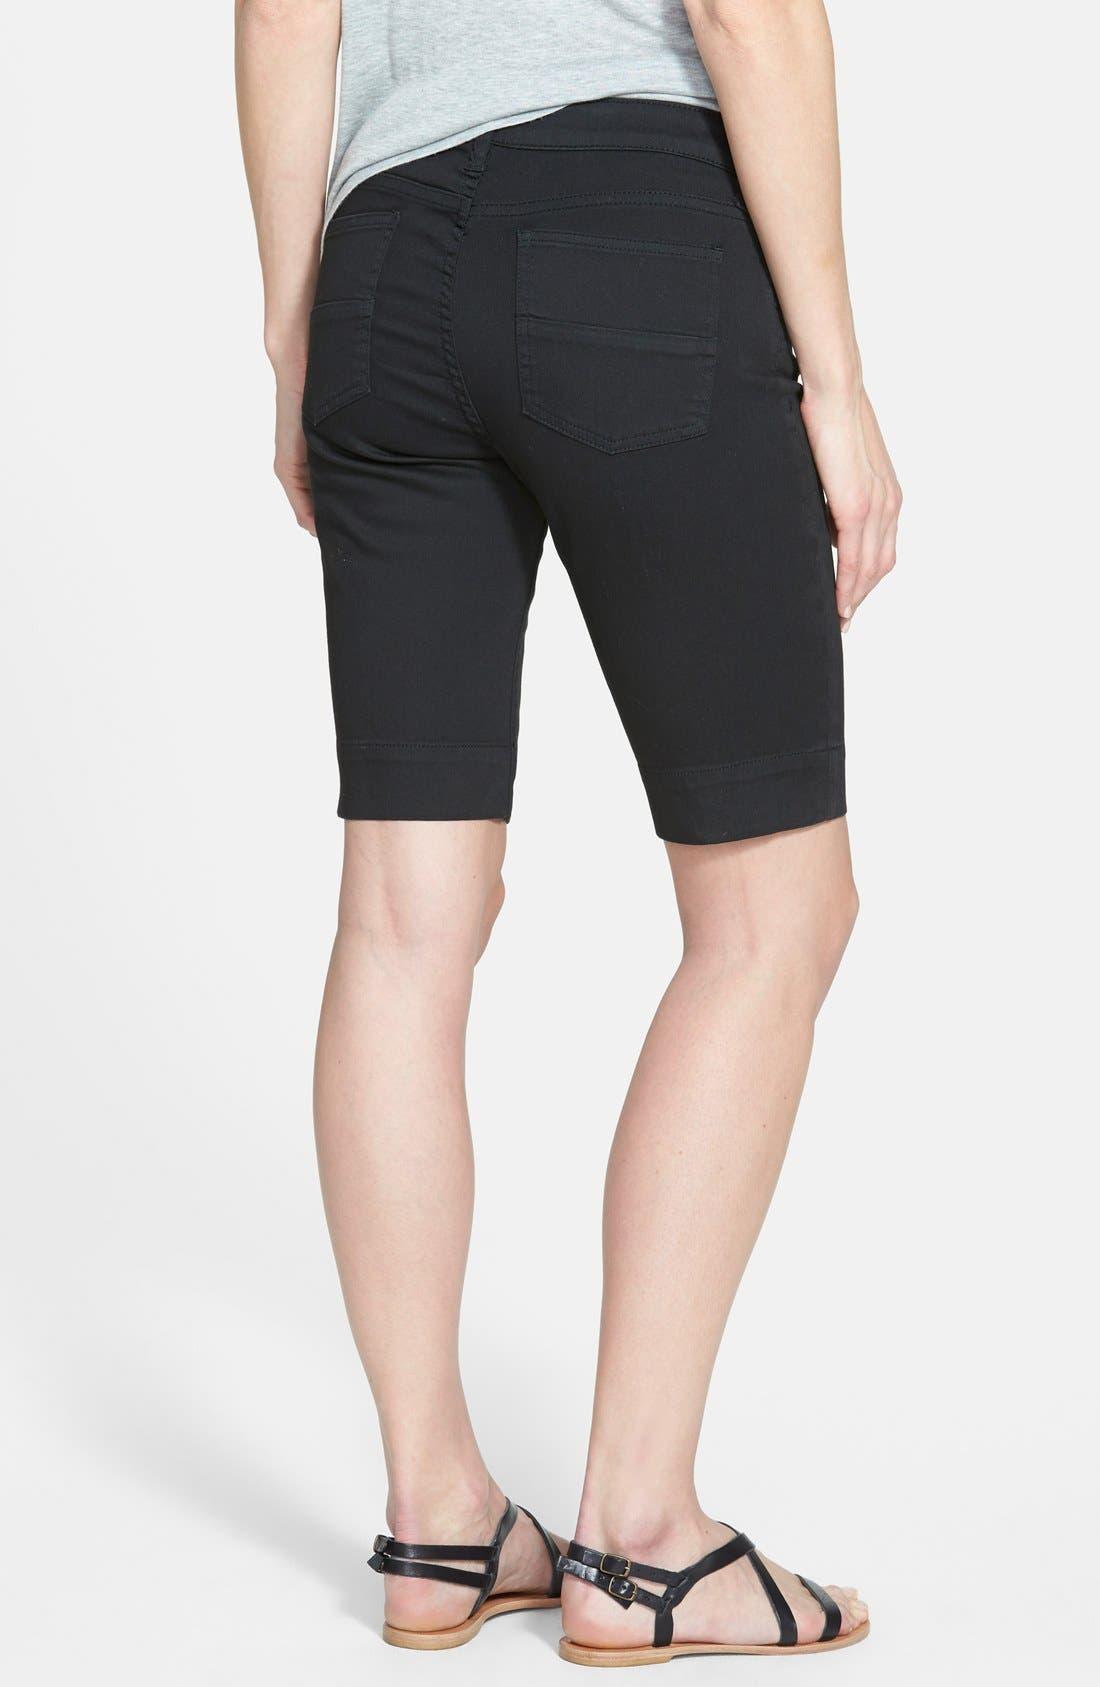 'Natalie' Twill Bermuda Shorts,                             Alternate thumbnail 8, color,                             001